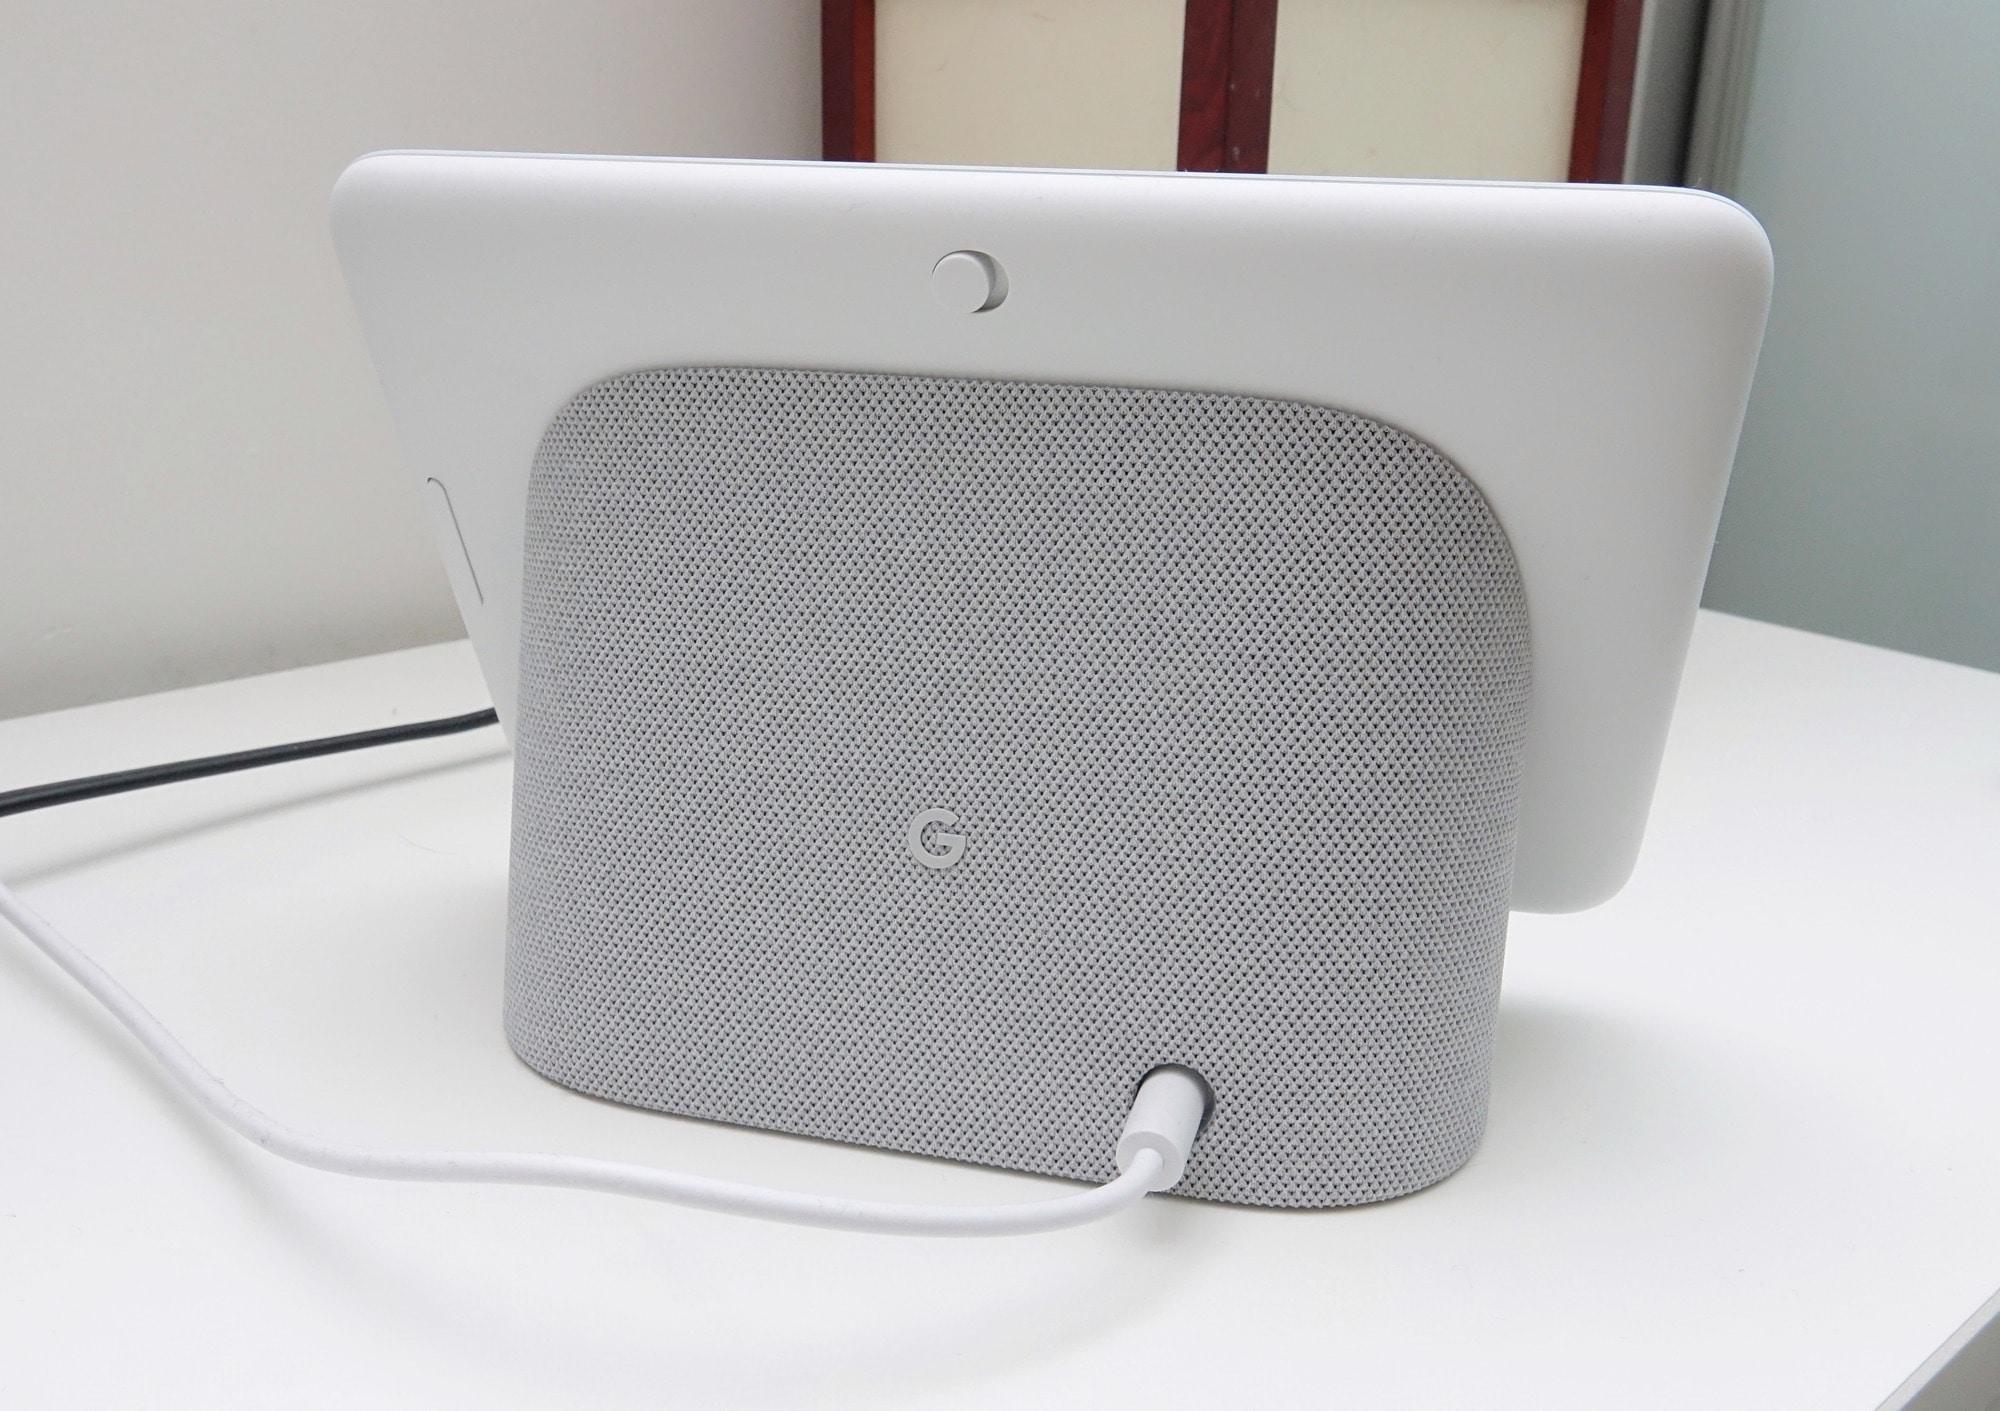 Google Nest Hub 2021 reviewed